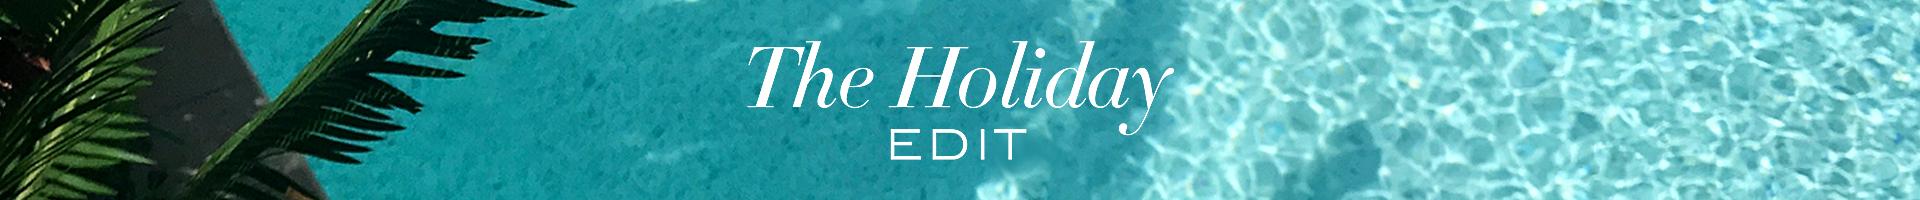 Holiday Edit